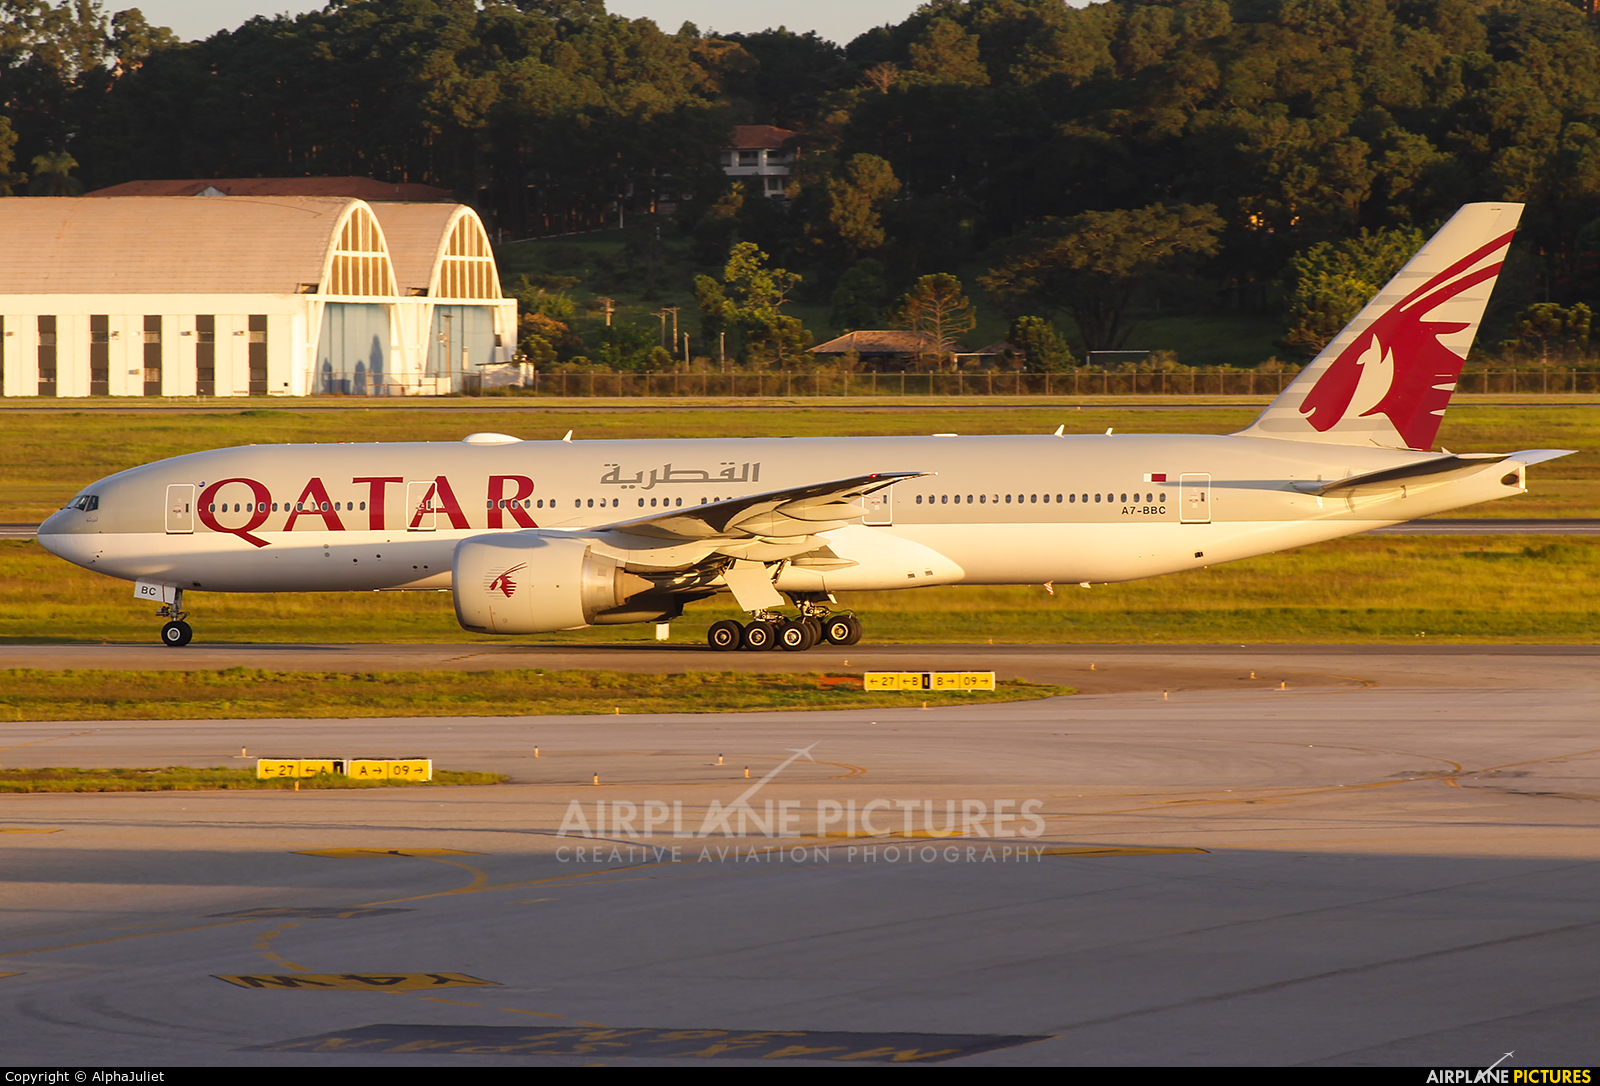 Qatar Airways A7-BBC aircraft at São Paulo - Guarulhos